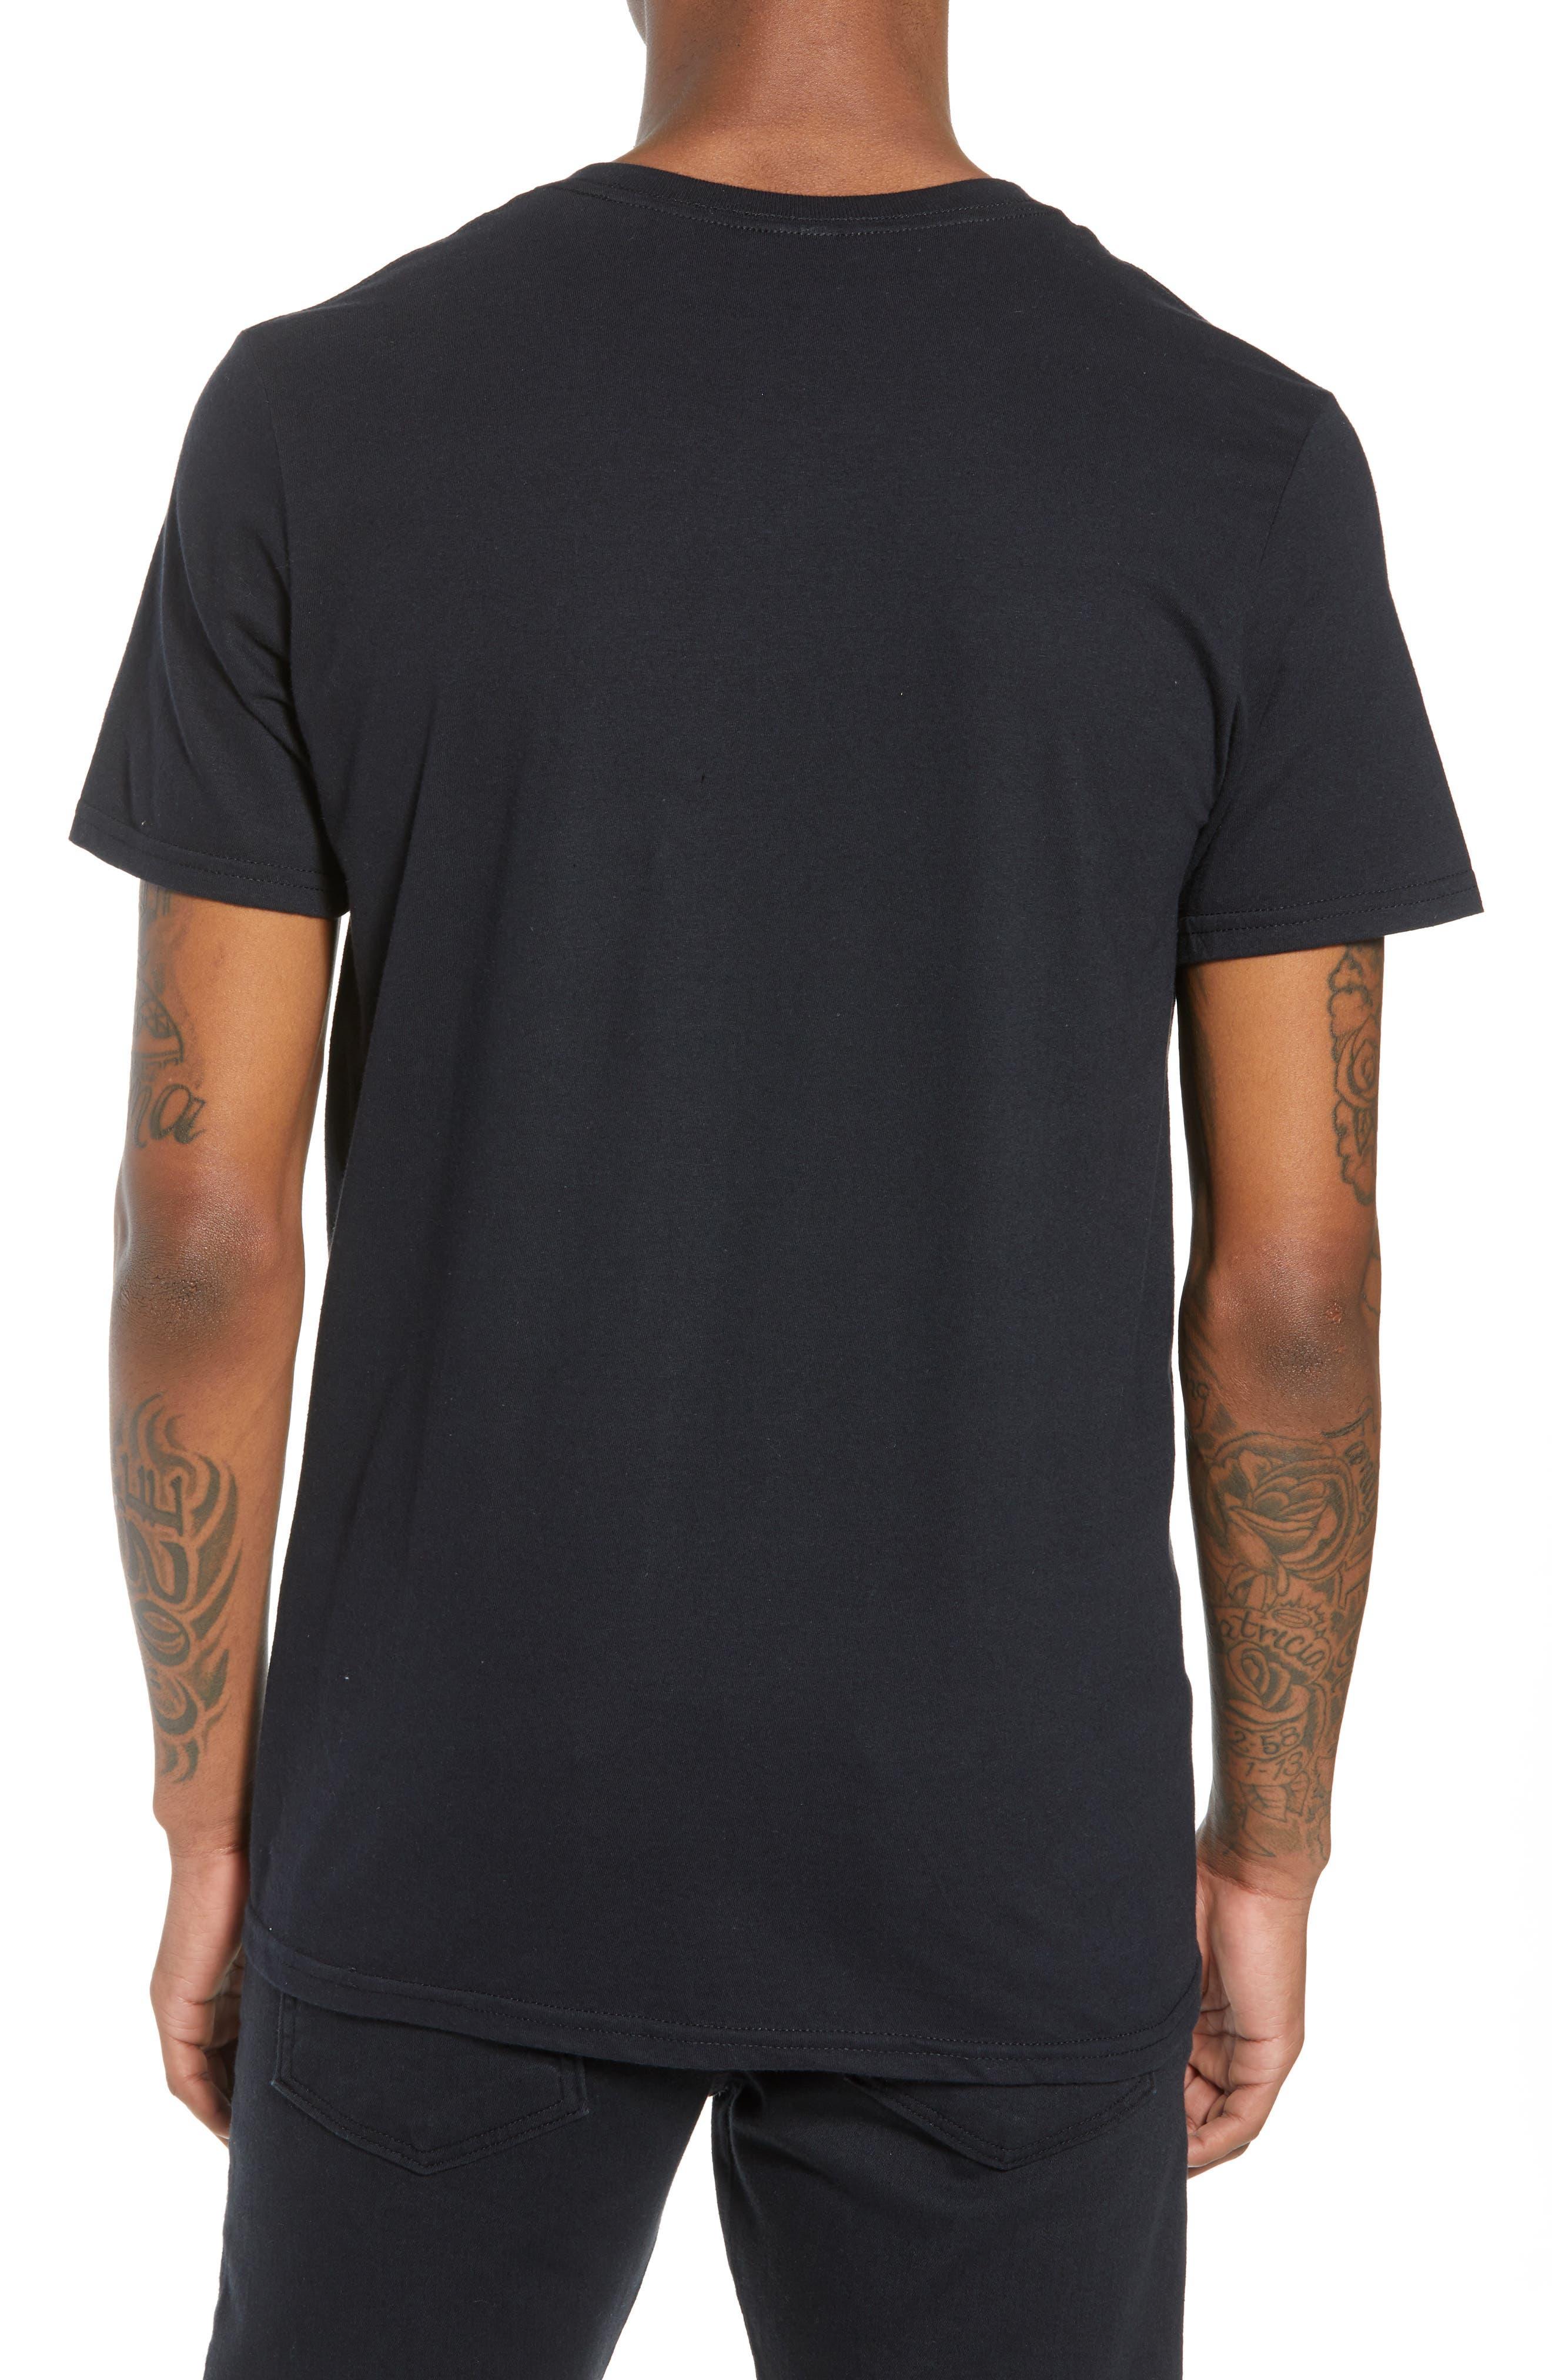 Run-DMC T-Shirt,                             Alternate thumbnail 2, color,                             Black Tee Run Dmc